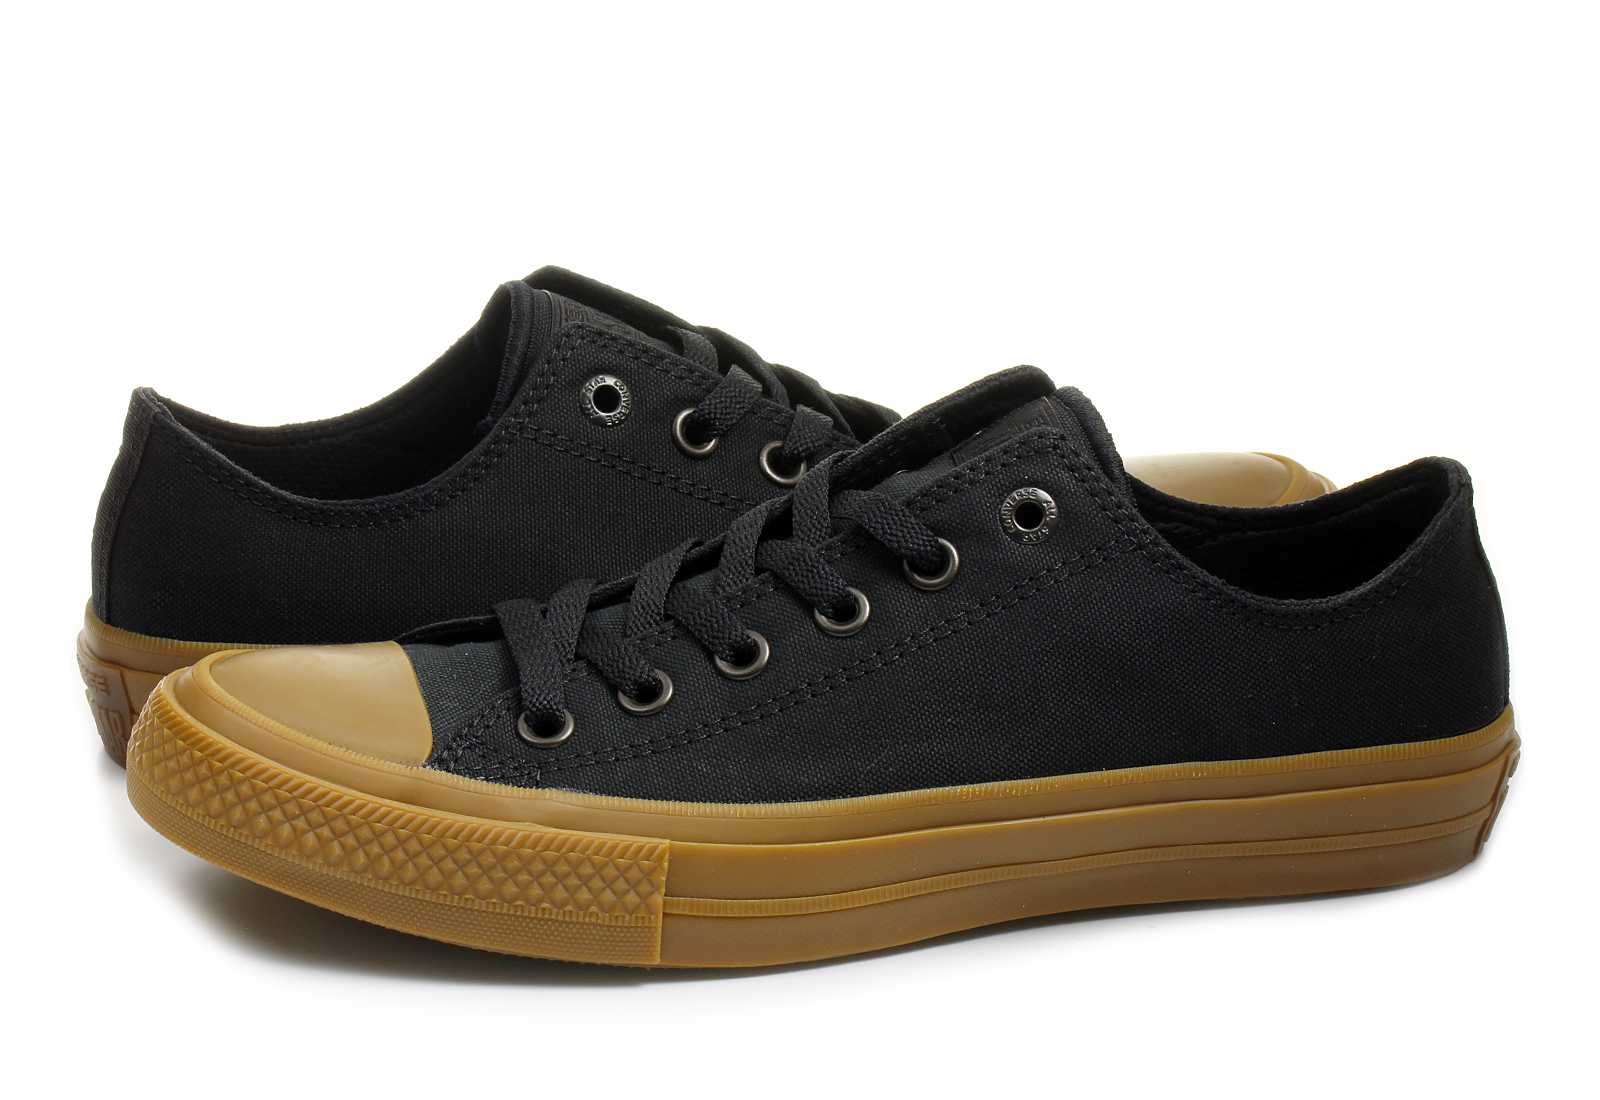 a7aefb82e7e1b3 Converse Sneakers - Chuck Taylor All Star II Gumsole Ox - 155501C ...